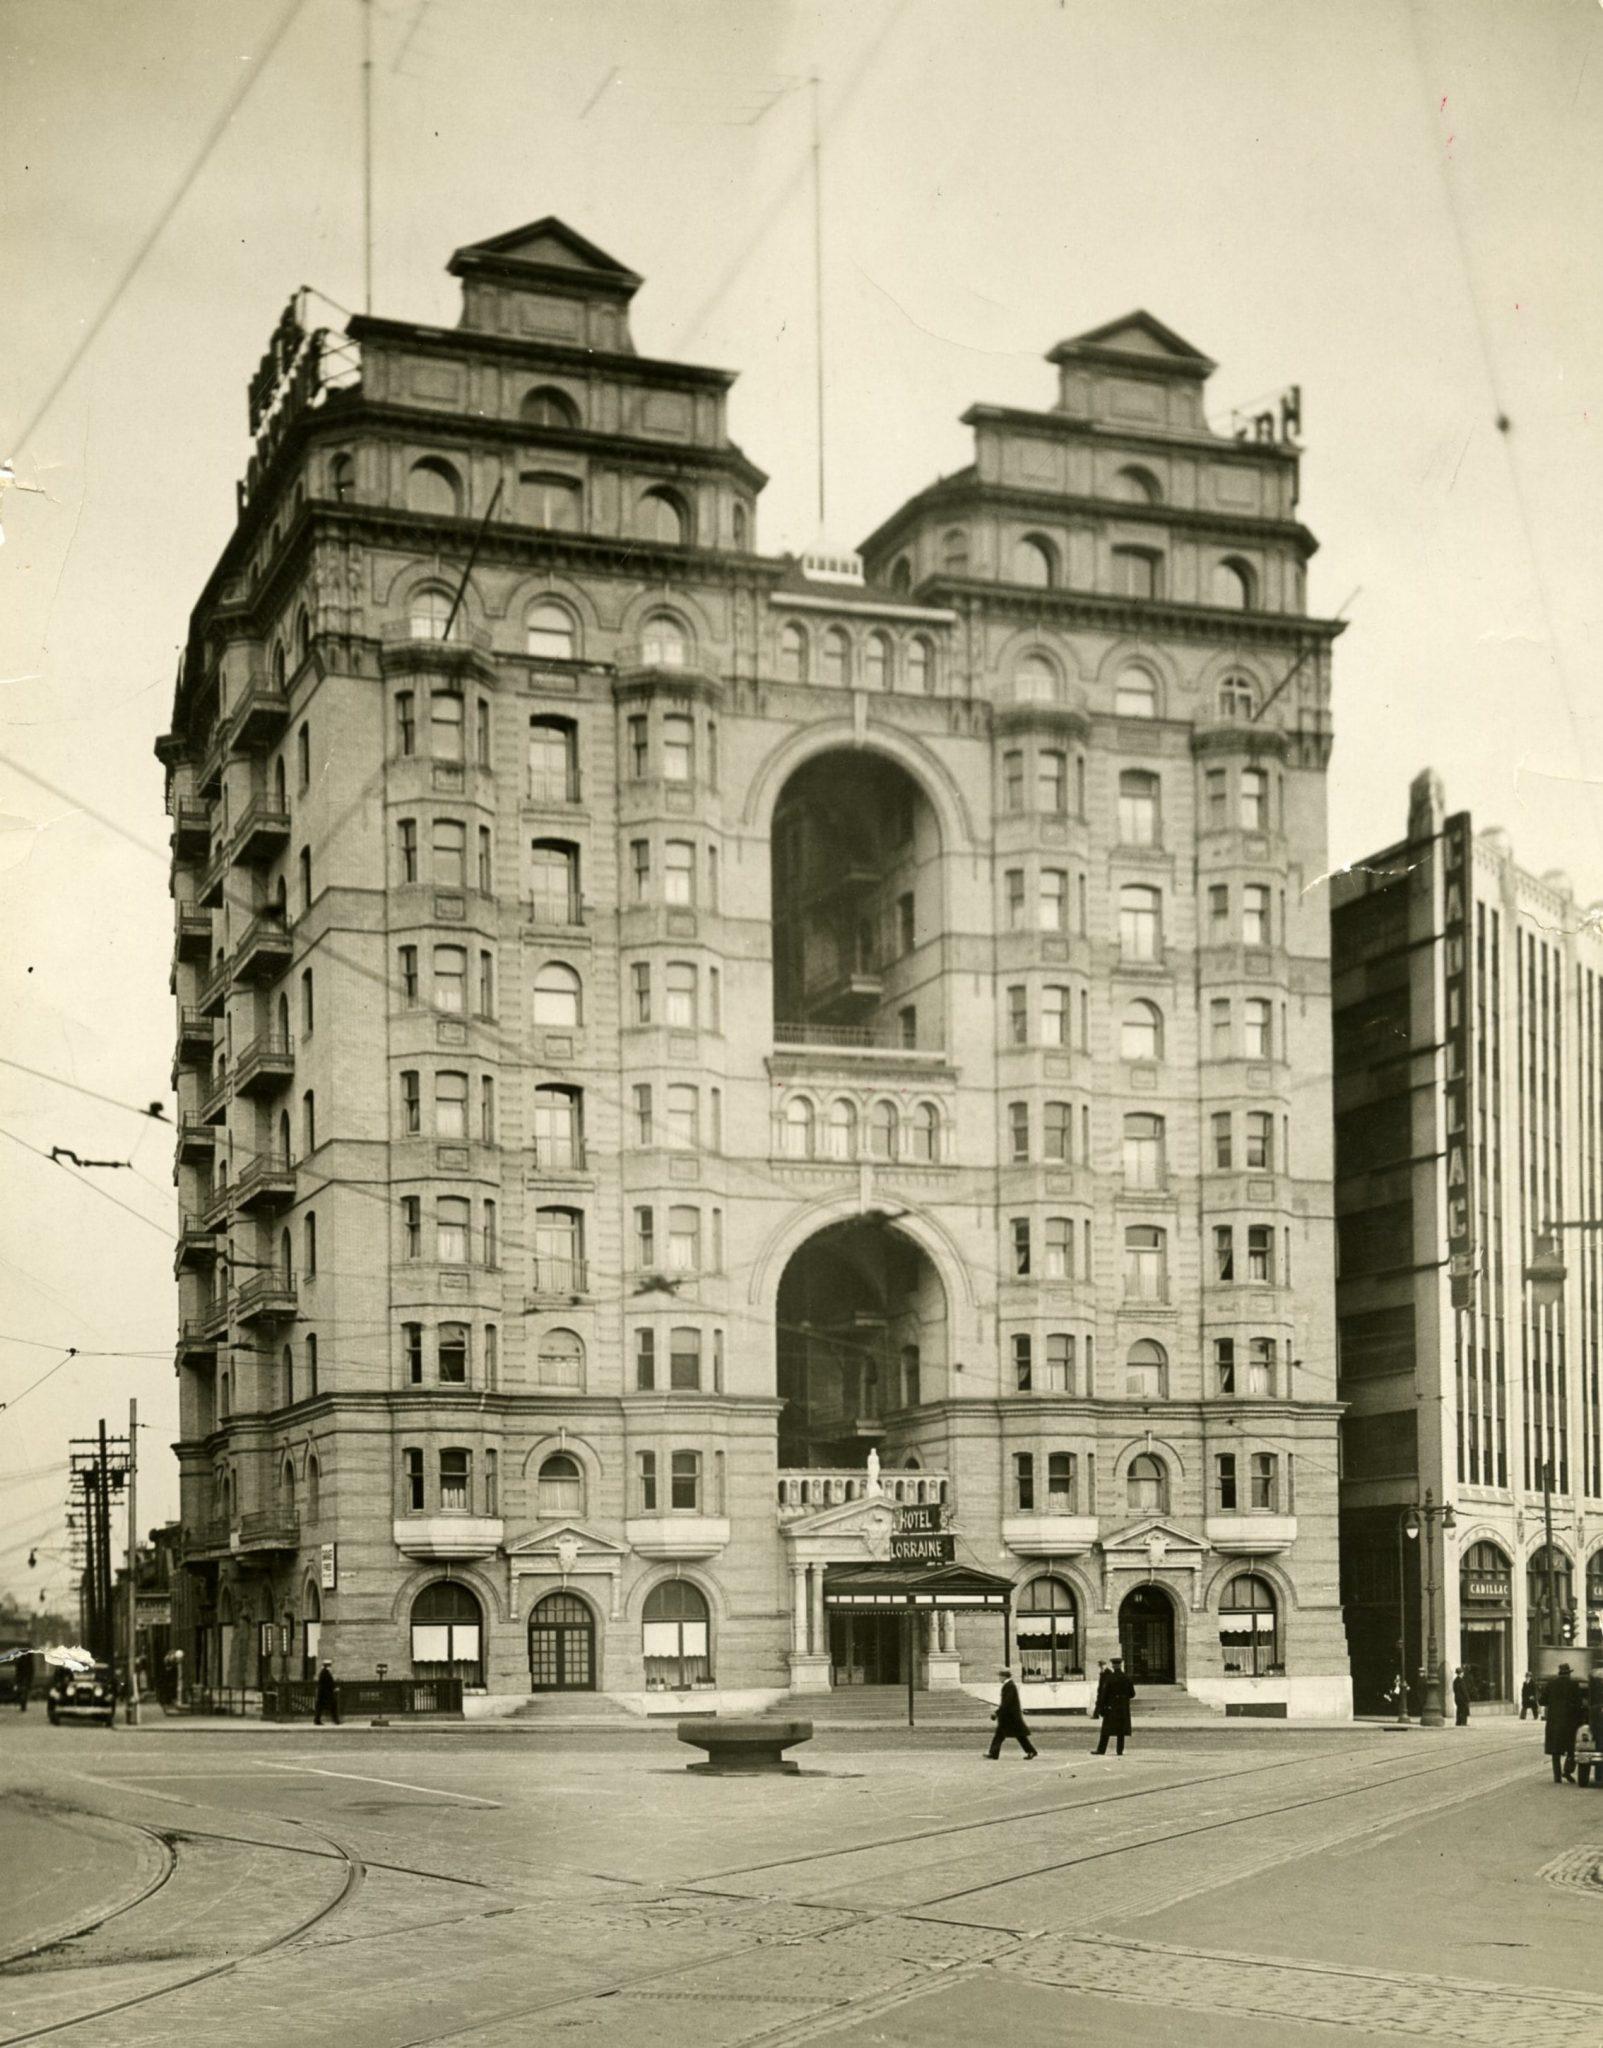 Philadelphia buildings